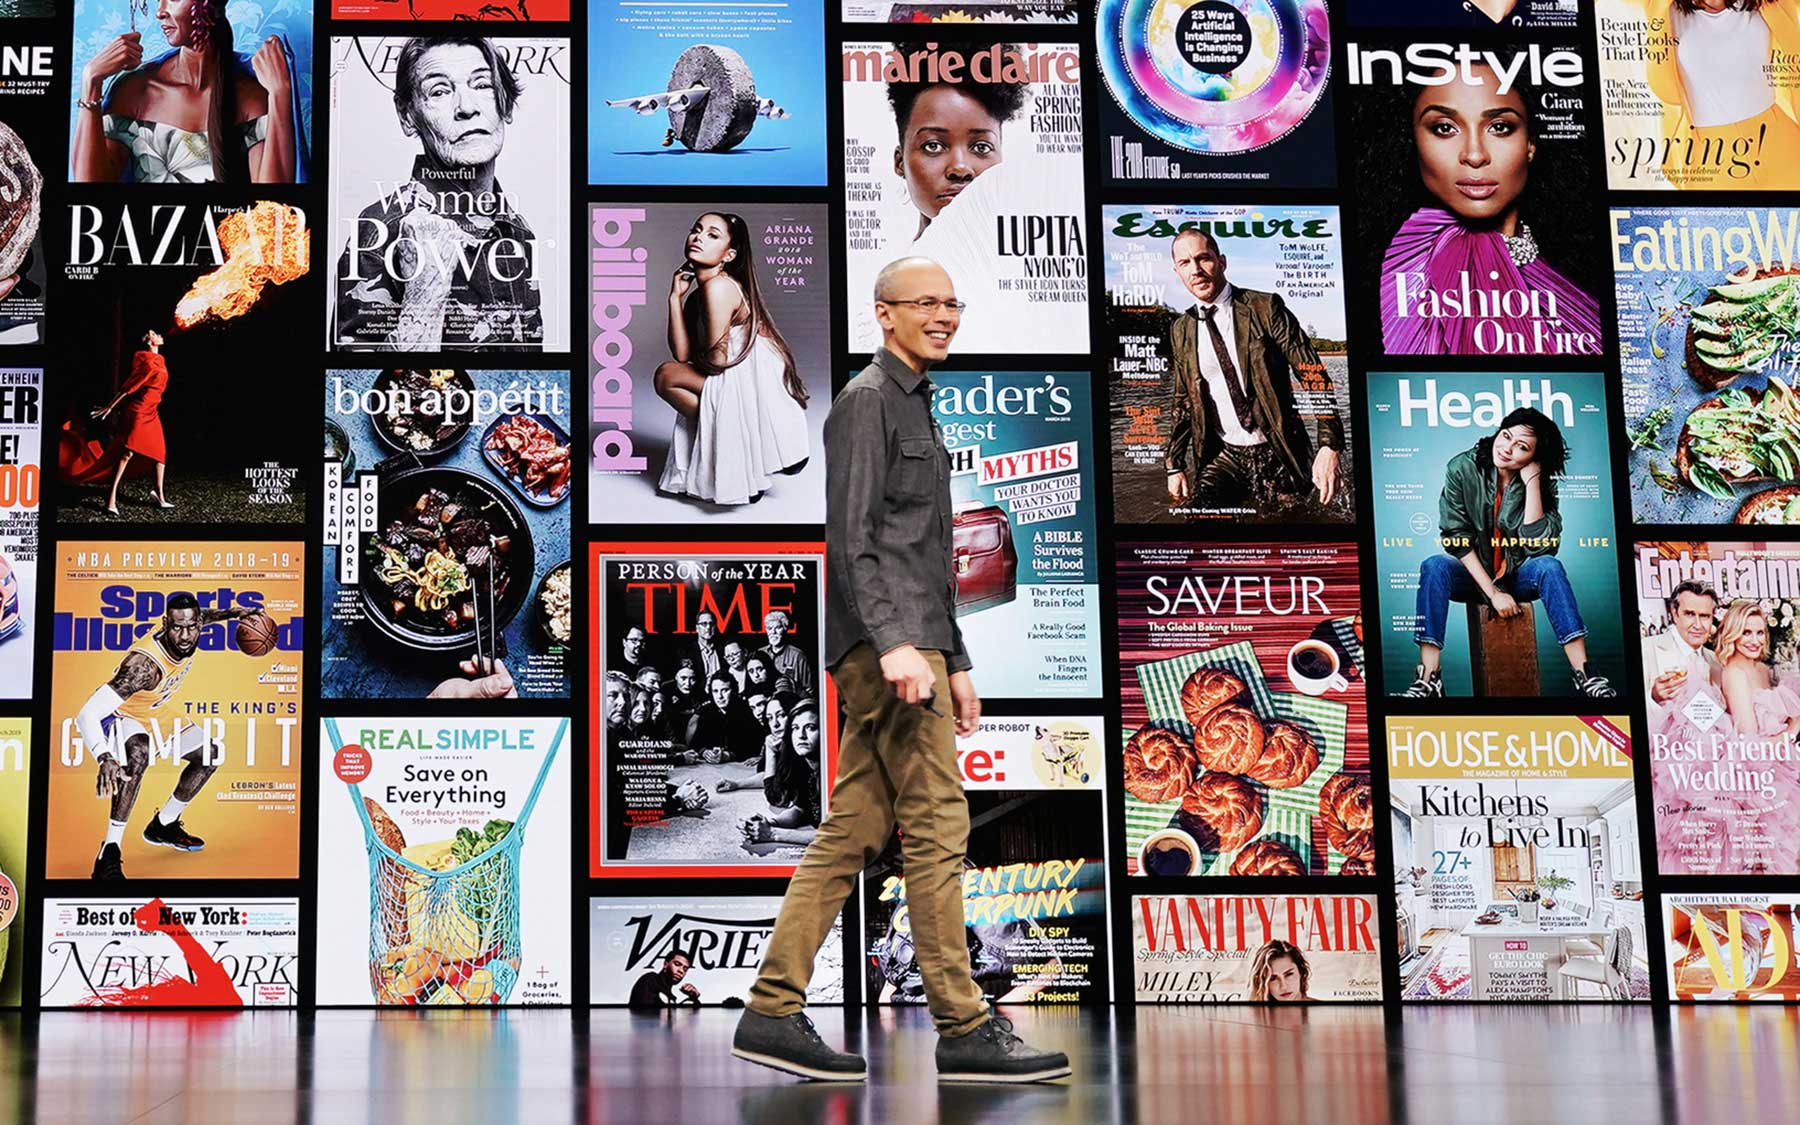 Apple-News-Plus-Magazines